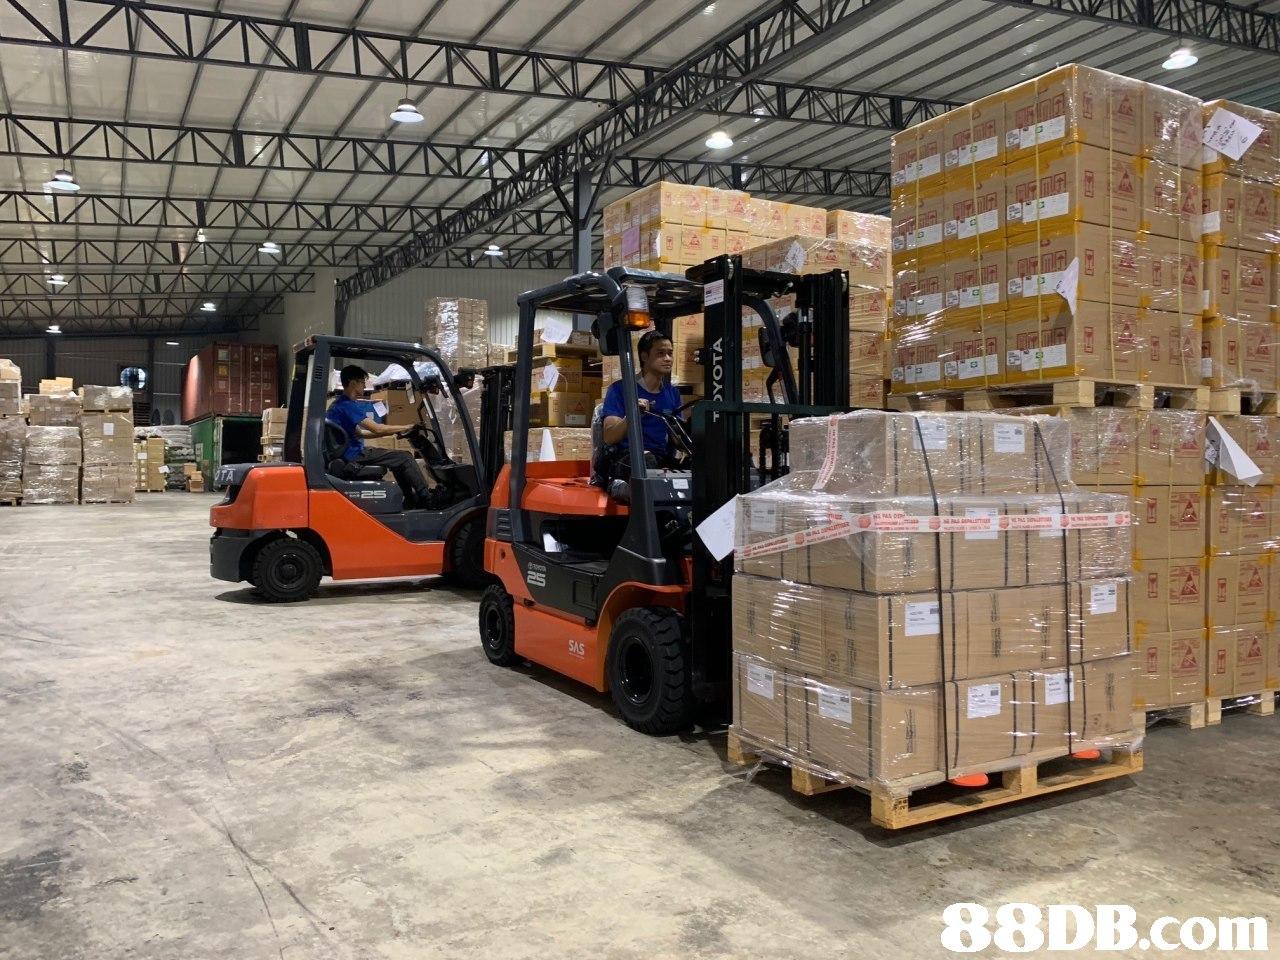 8DB.com  Warehouse,Forklift truck,Warehouseman,Transport,Inventory